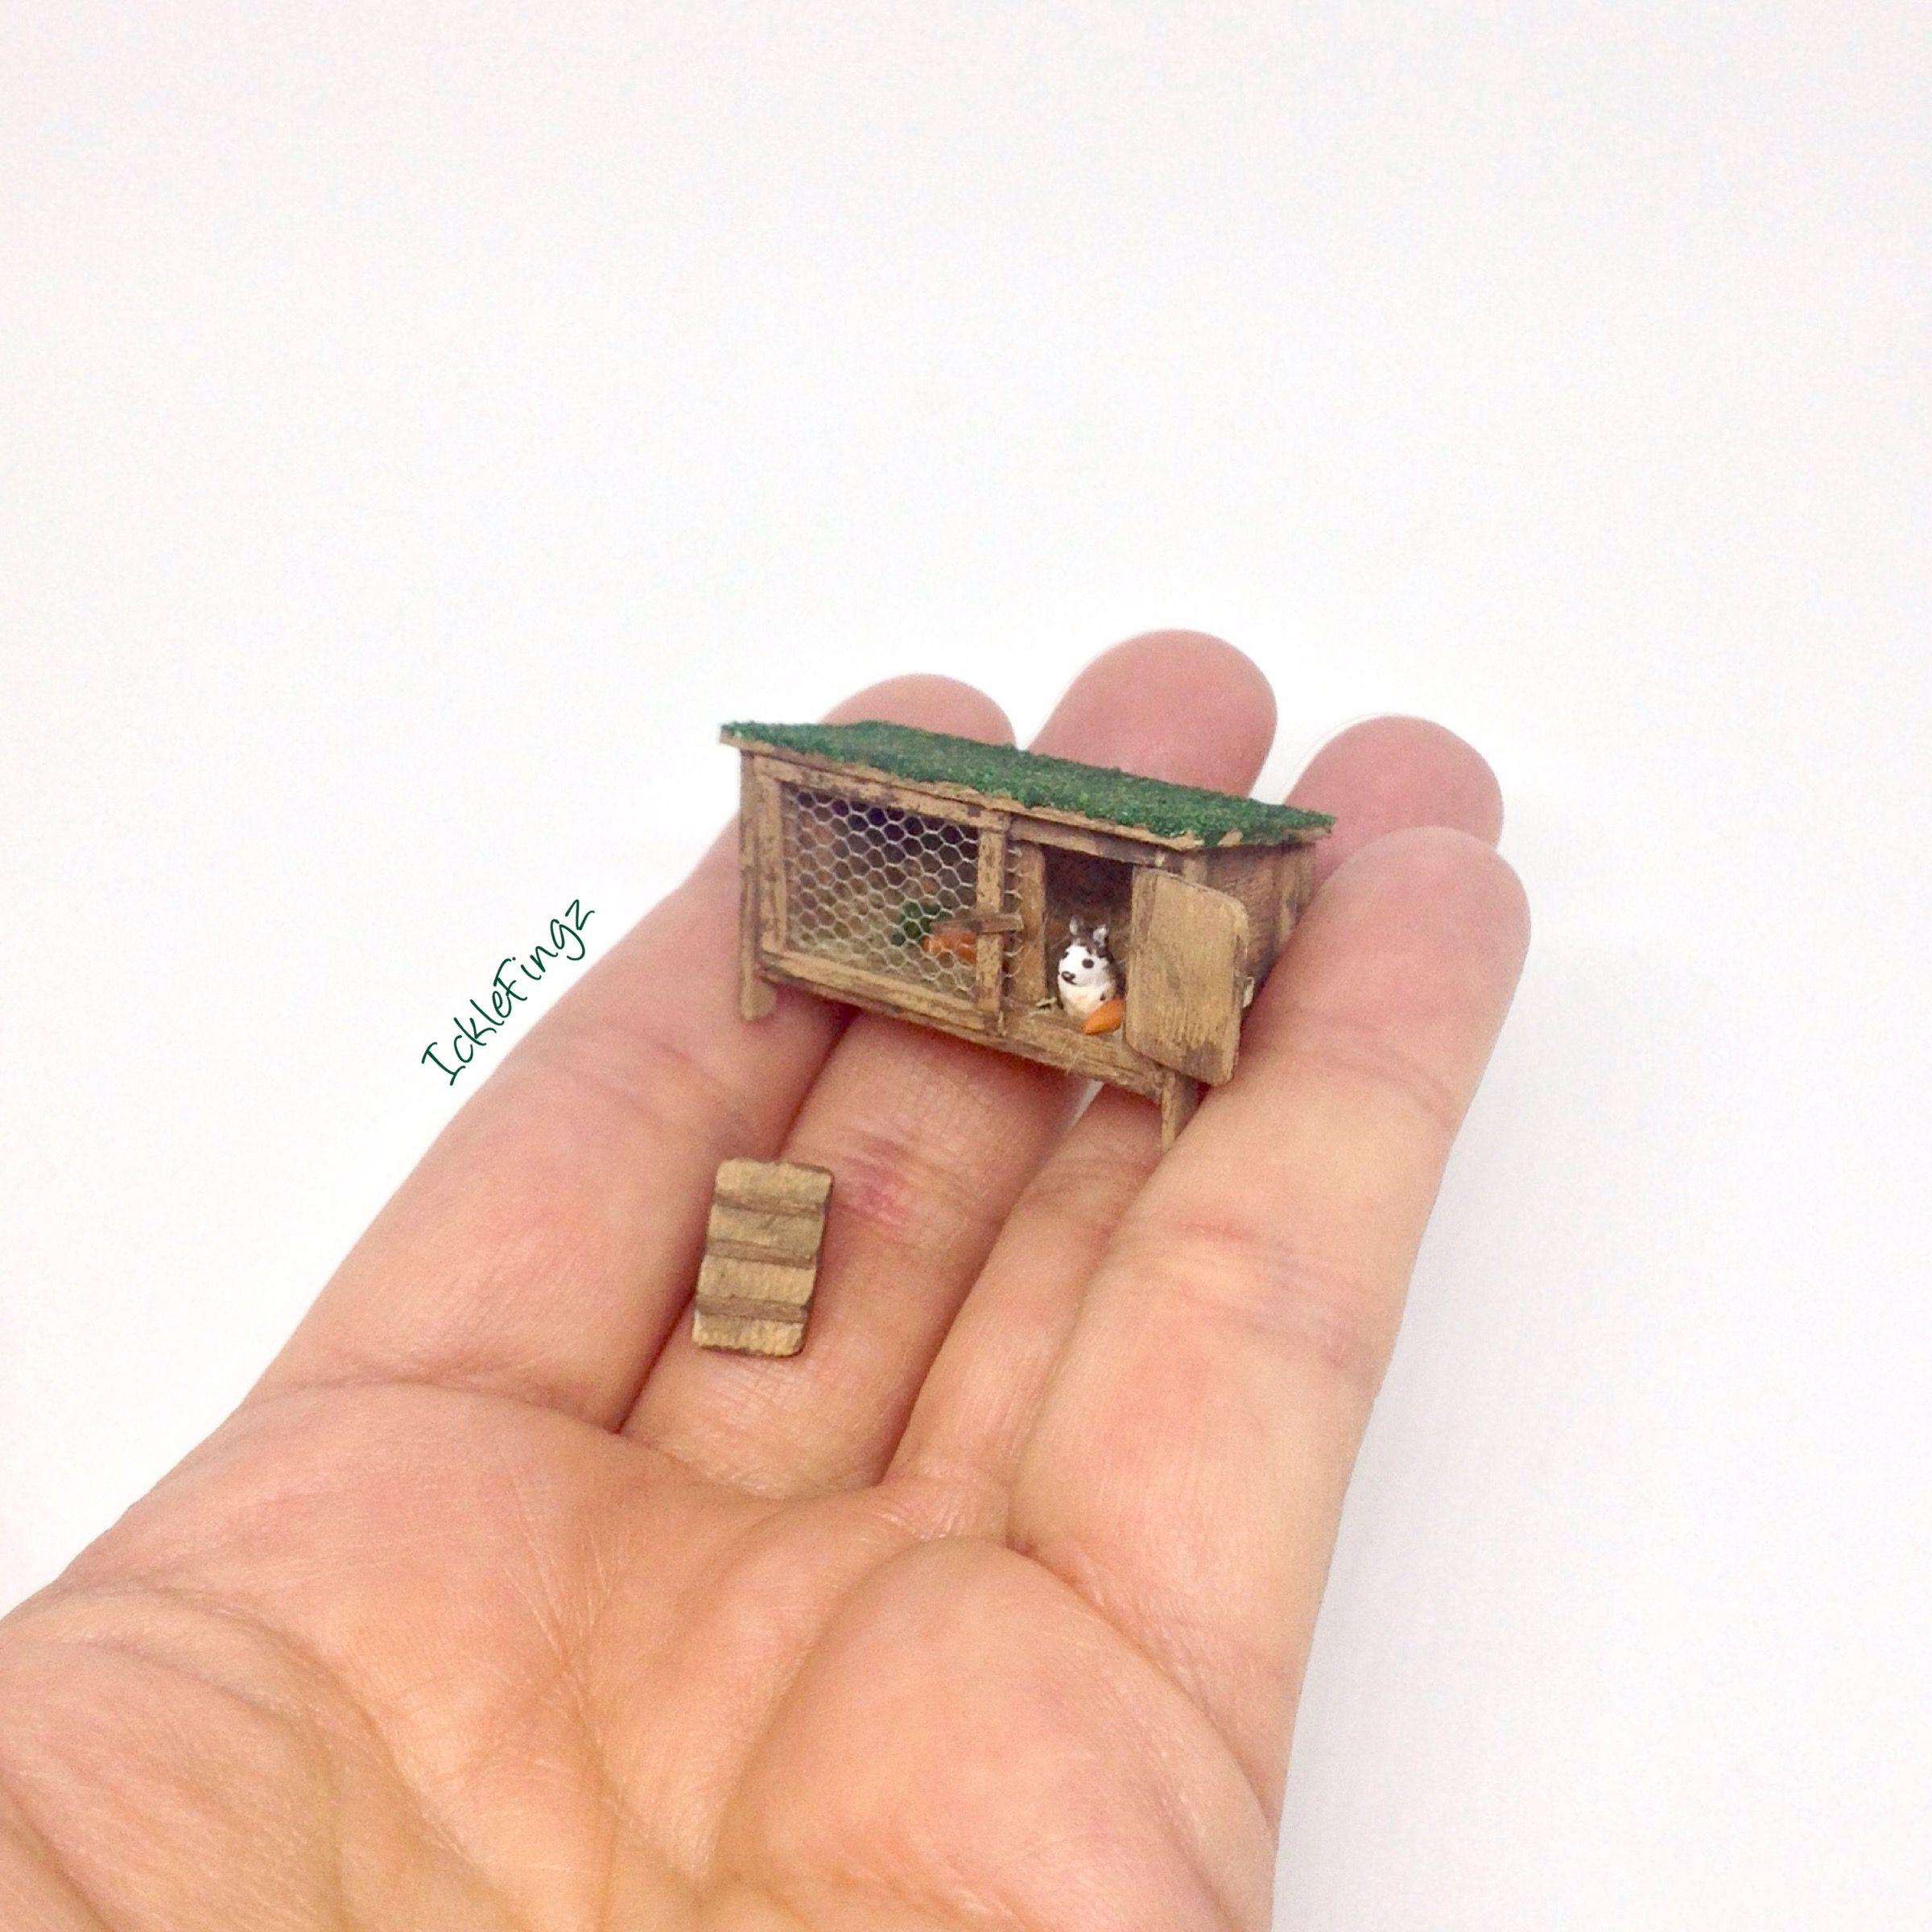 Pin By Melissa Hooker On Doll House & Fairy Garden Ideas